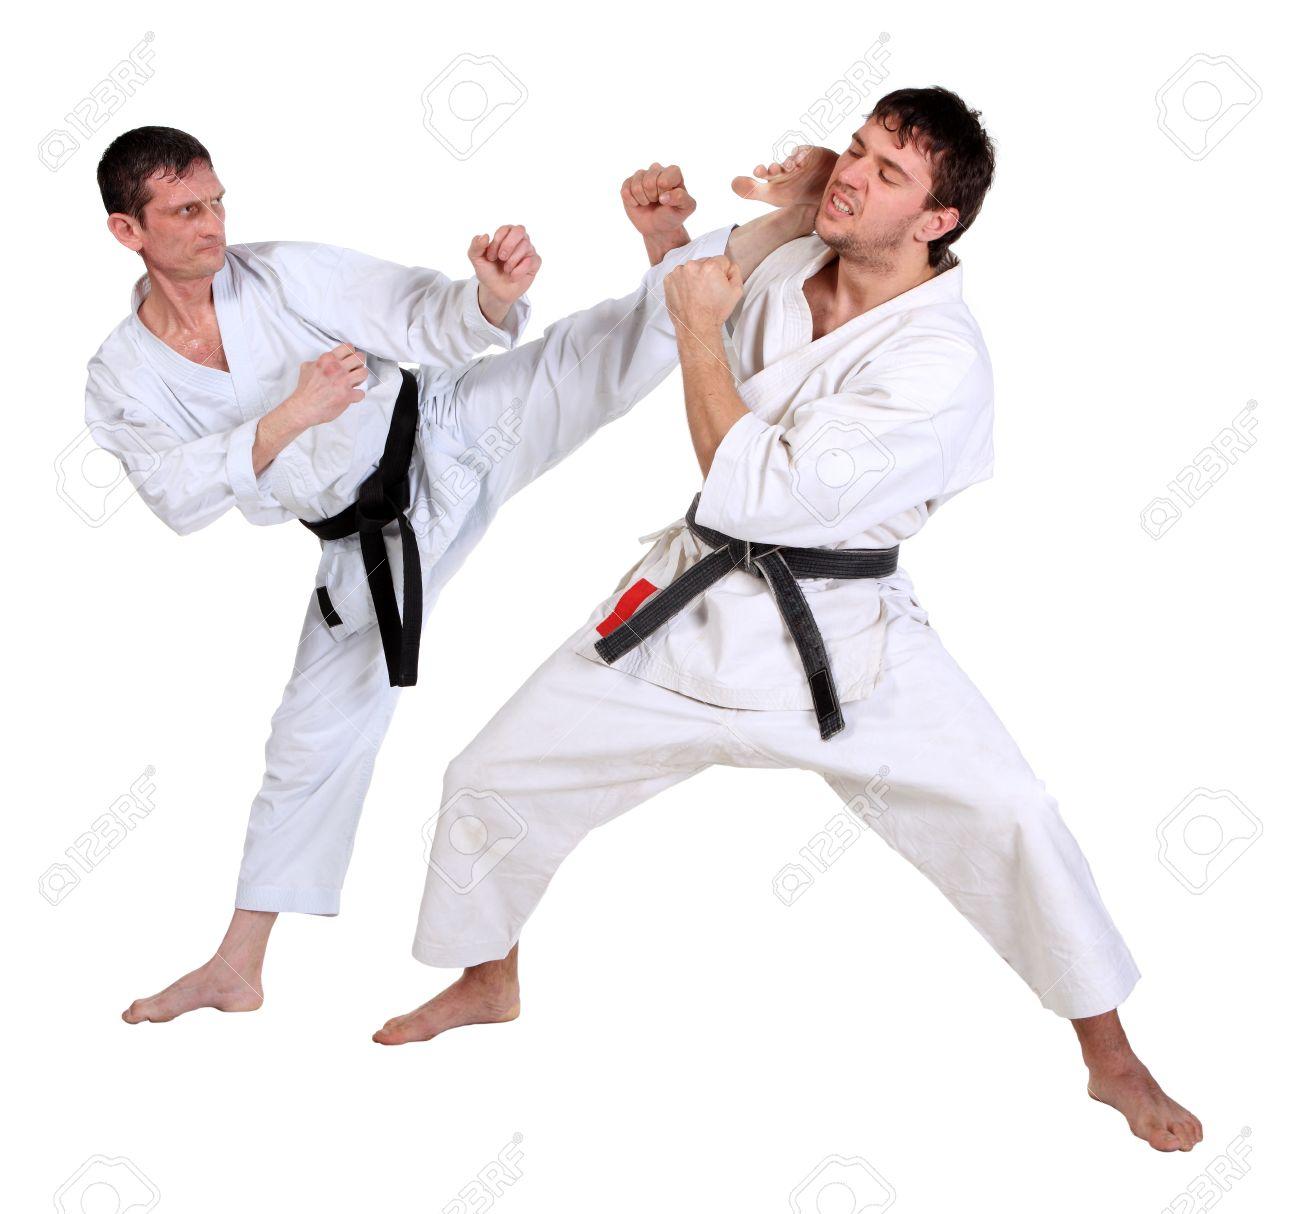 Karate vs taekwondo movie - Best movies out now australia